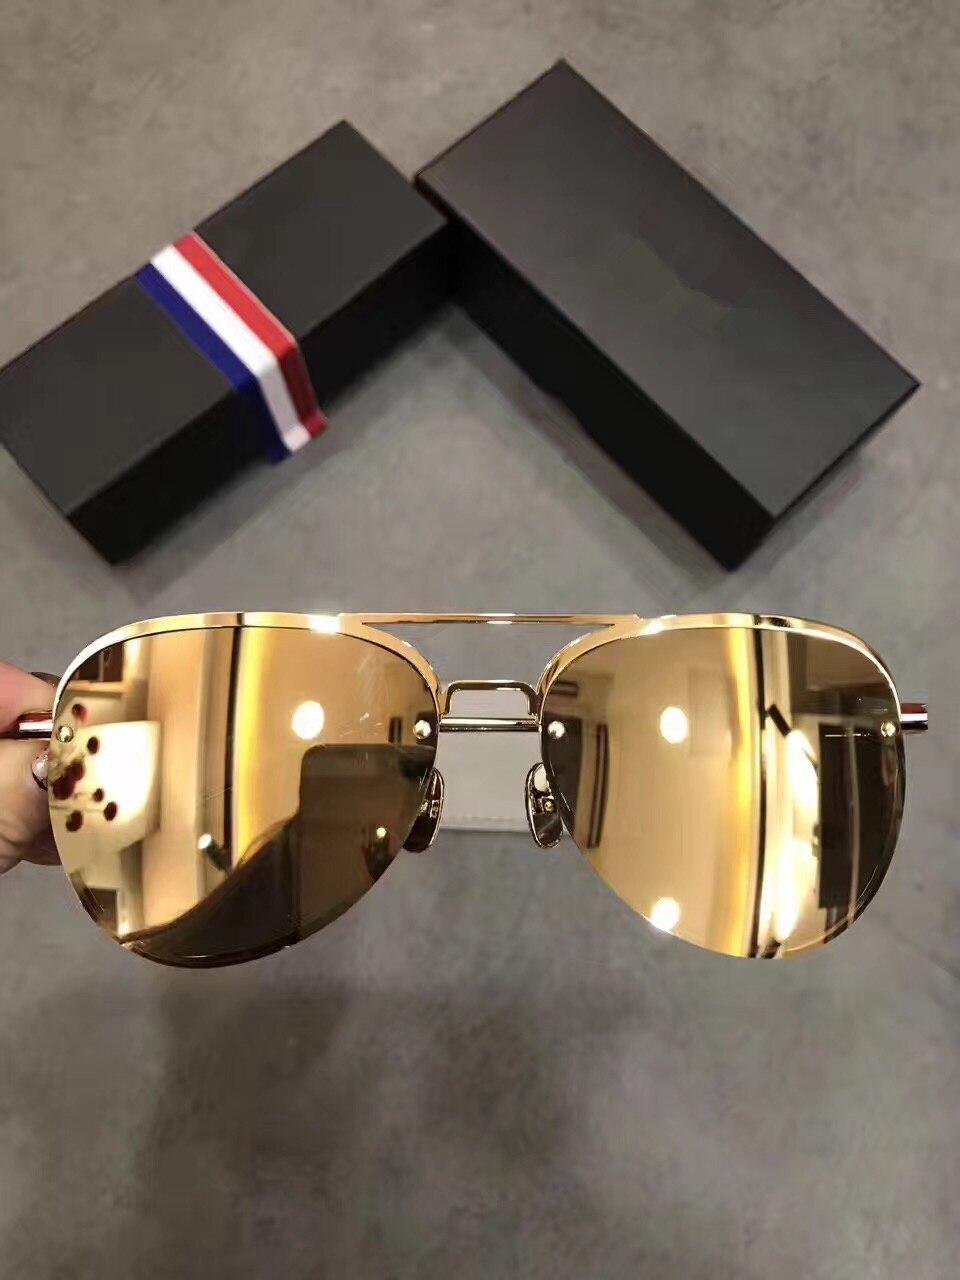 Vintage Oculos Steampunk Sunglasses TB112 Men Women Metal Eyeglasses Brand Designer Sun Glasses Mirror Coating Glasses